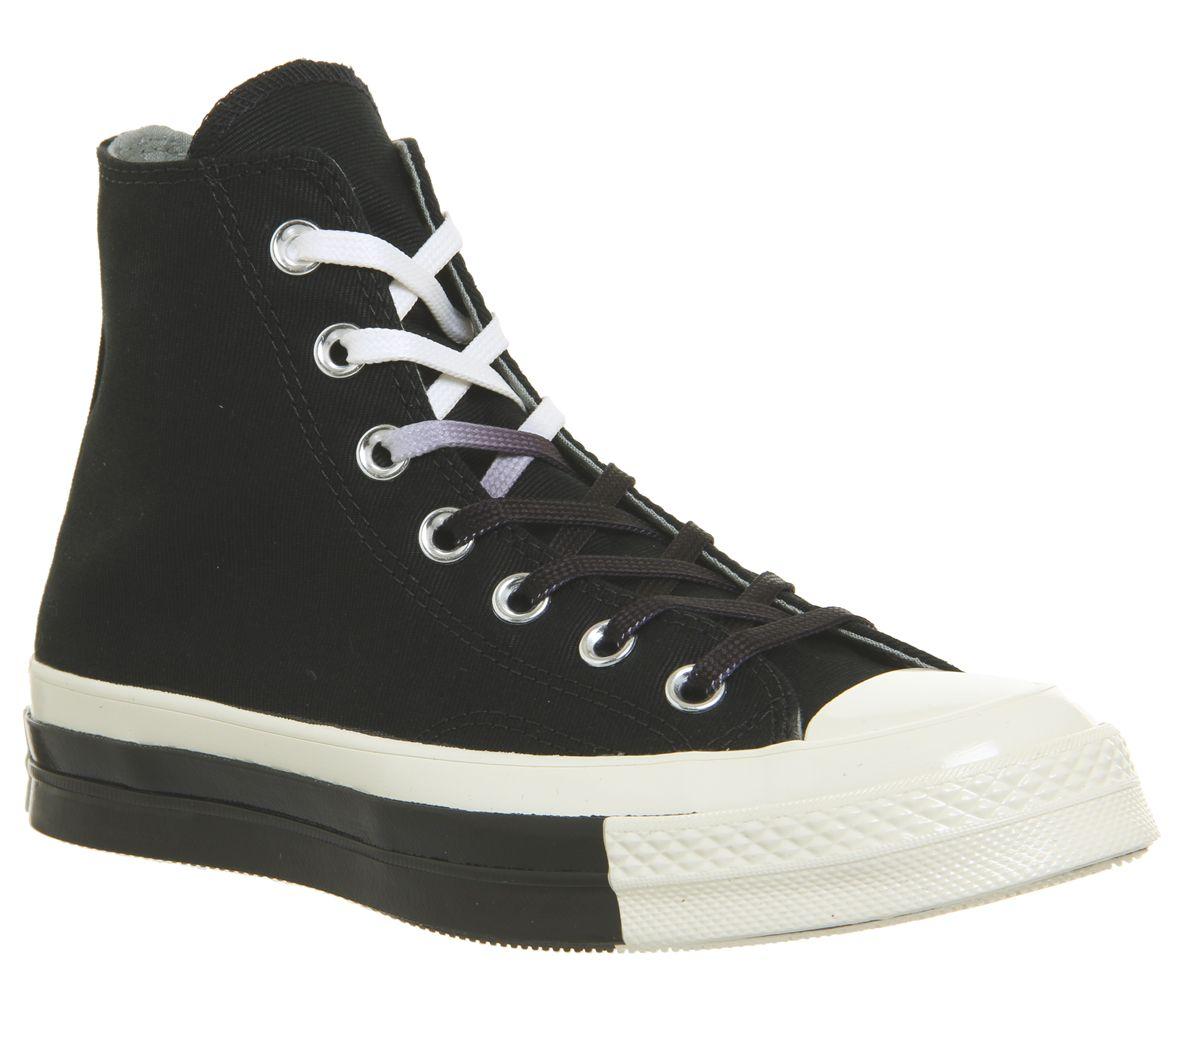 f45c38fb36ef Converse All Star Hi 70s Trainers Black Egret Split - Hers trainers